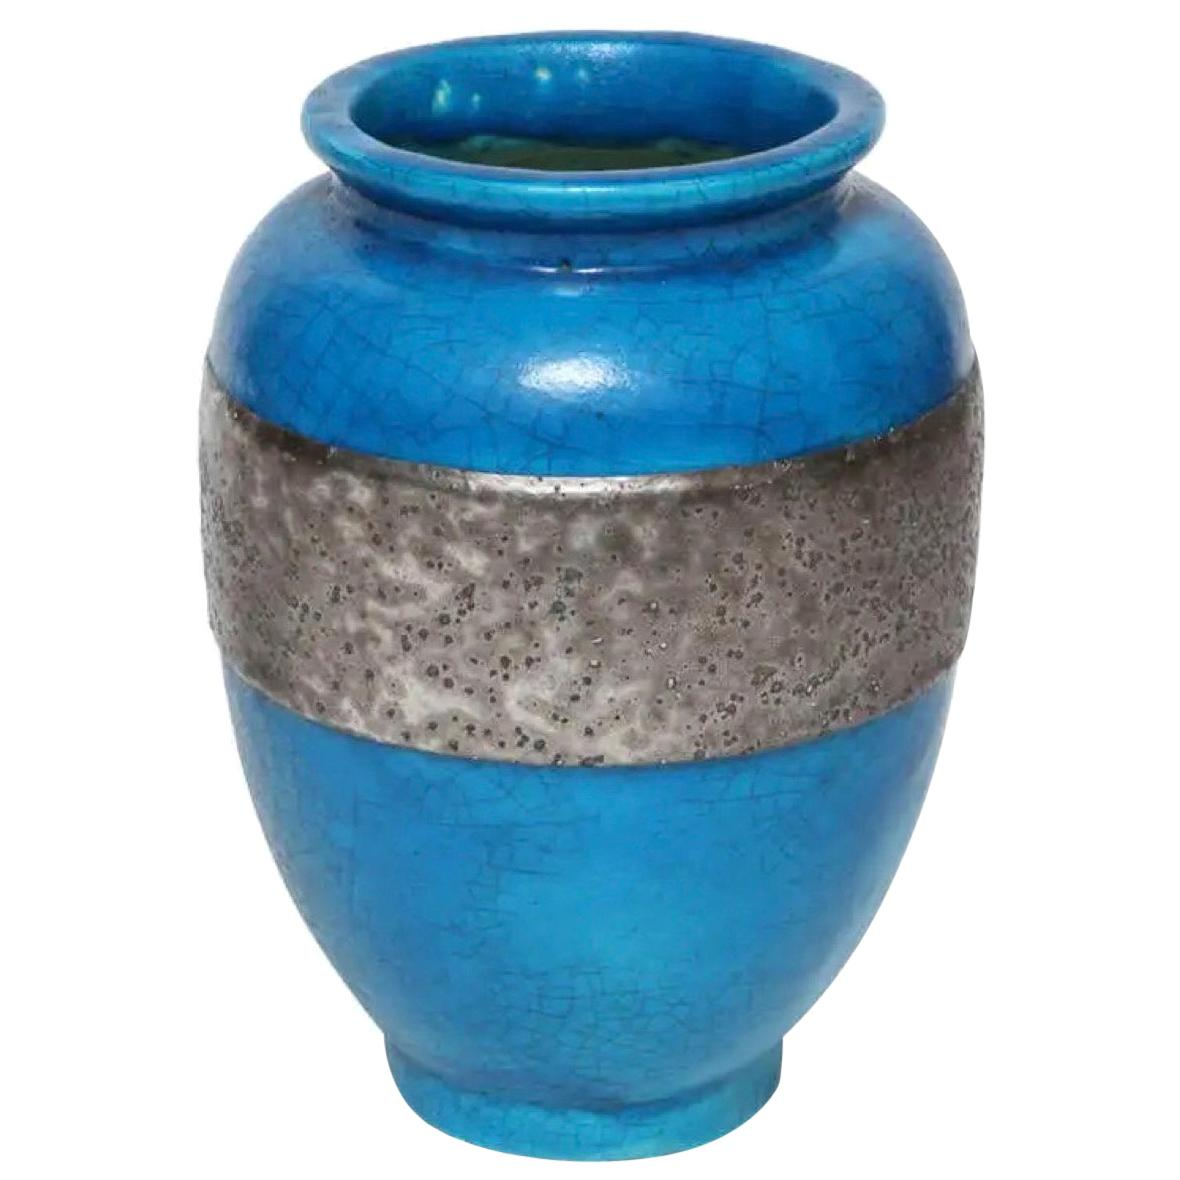 Raoul Lachenal Blue Crackle Glaze Ceramic Vase with Band, circa 1930s - 1940s